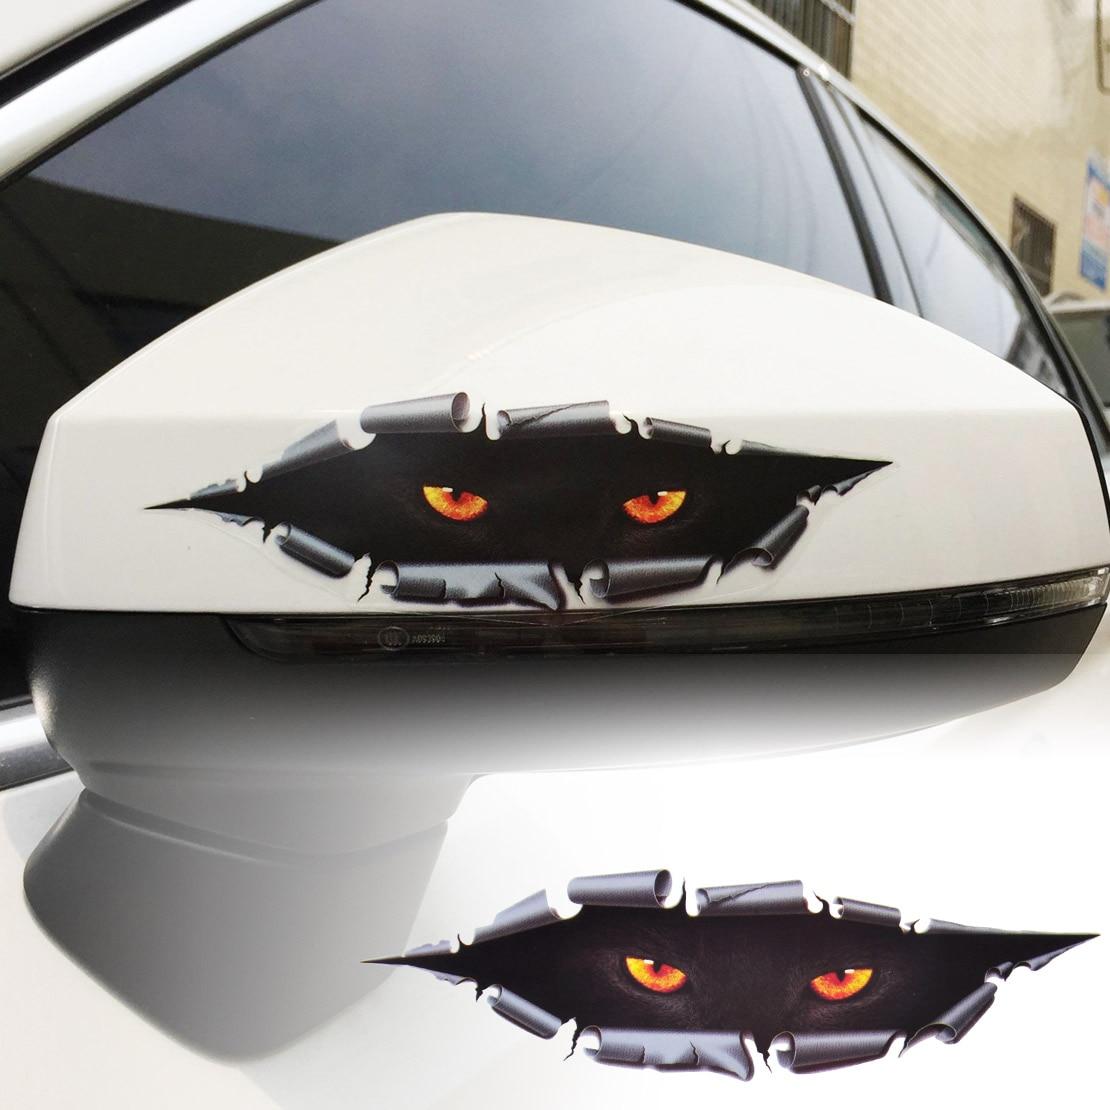 beler Funny 3D Simulation Monster Leopard Eye Peeking Sticker Decal Auto Car Window Car Styling For VW Audi Ford Toyota Nissan